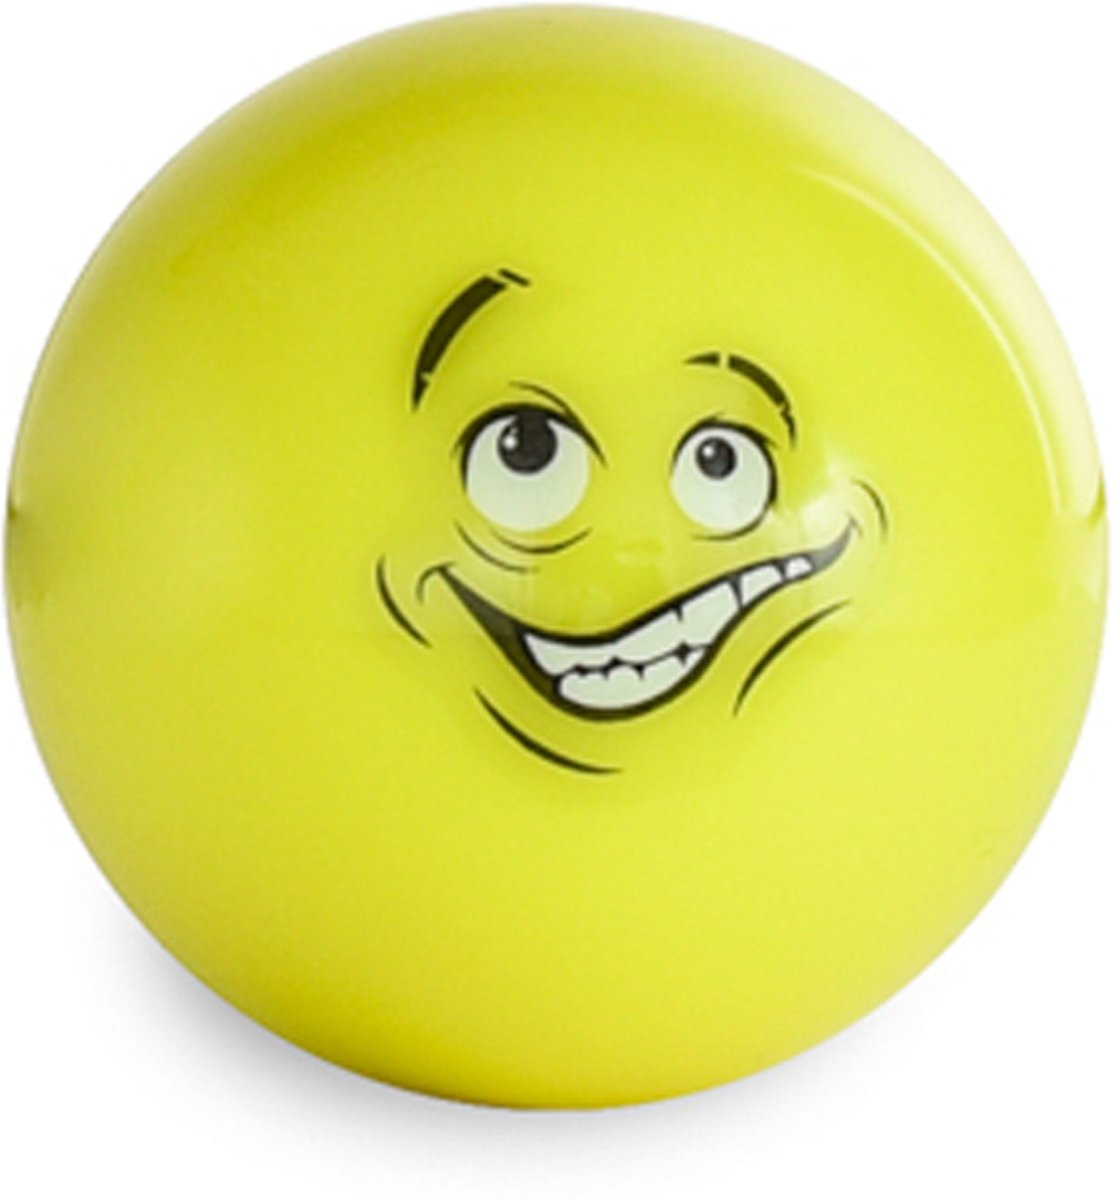 Brabo Hockeybal - geel kopen